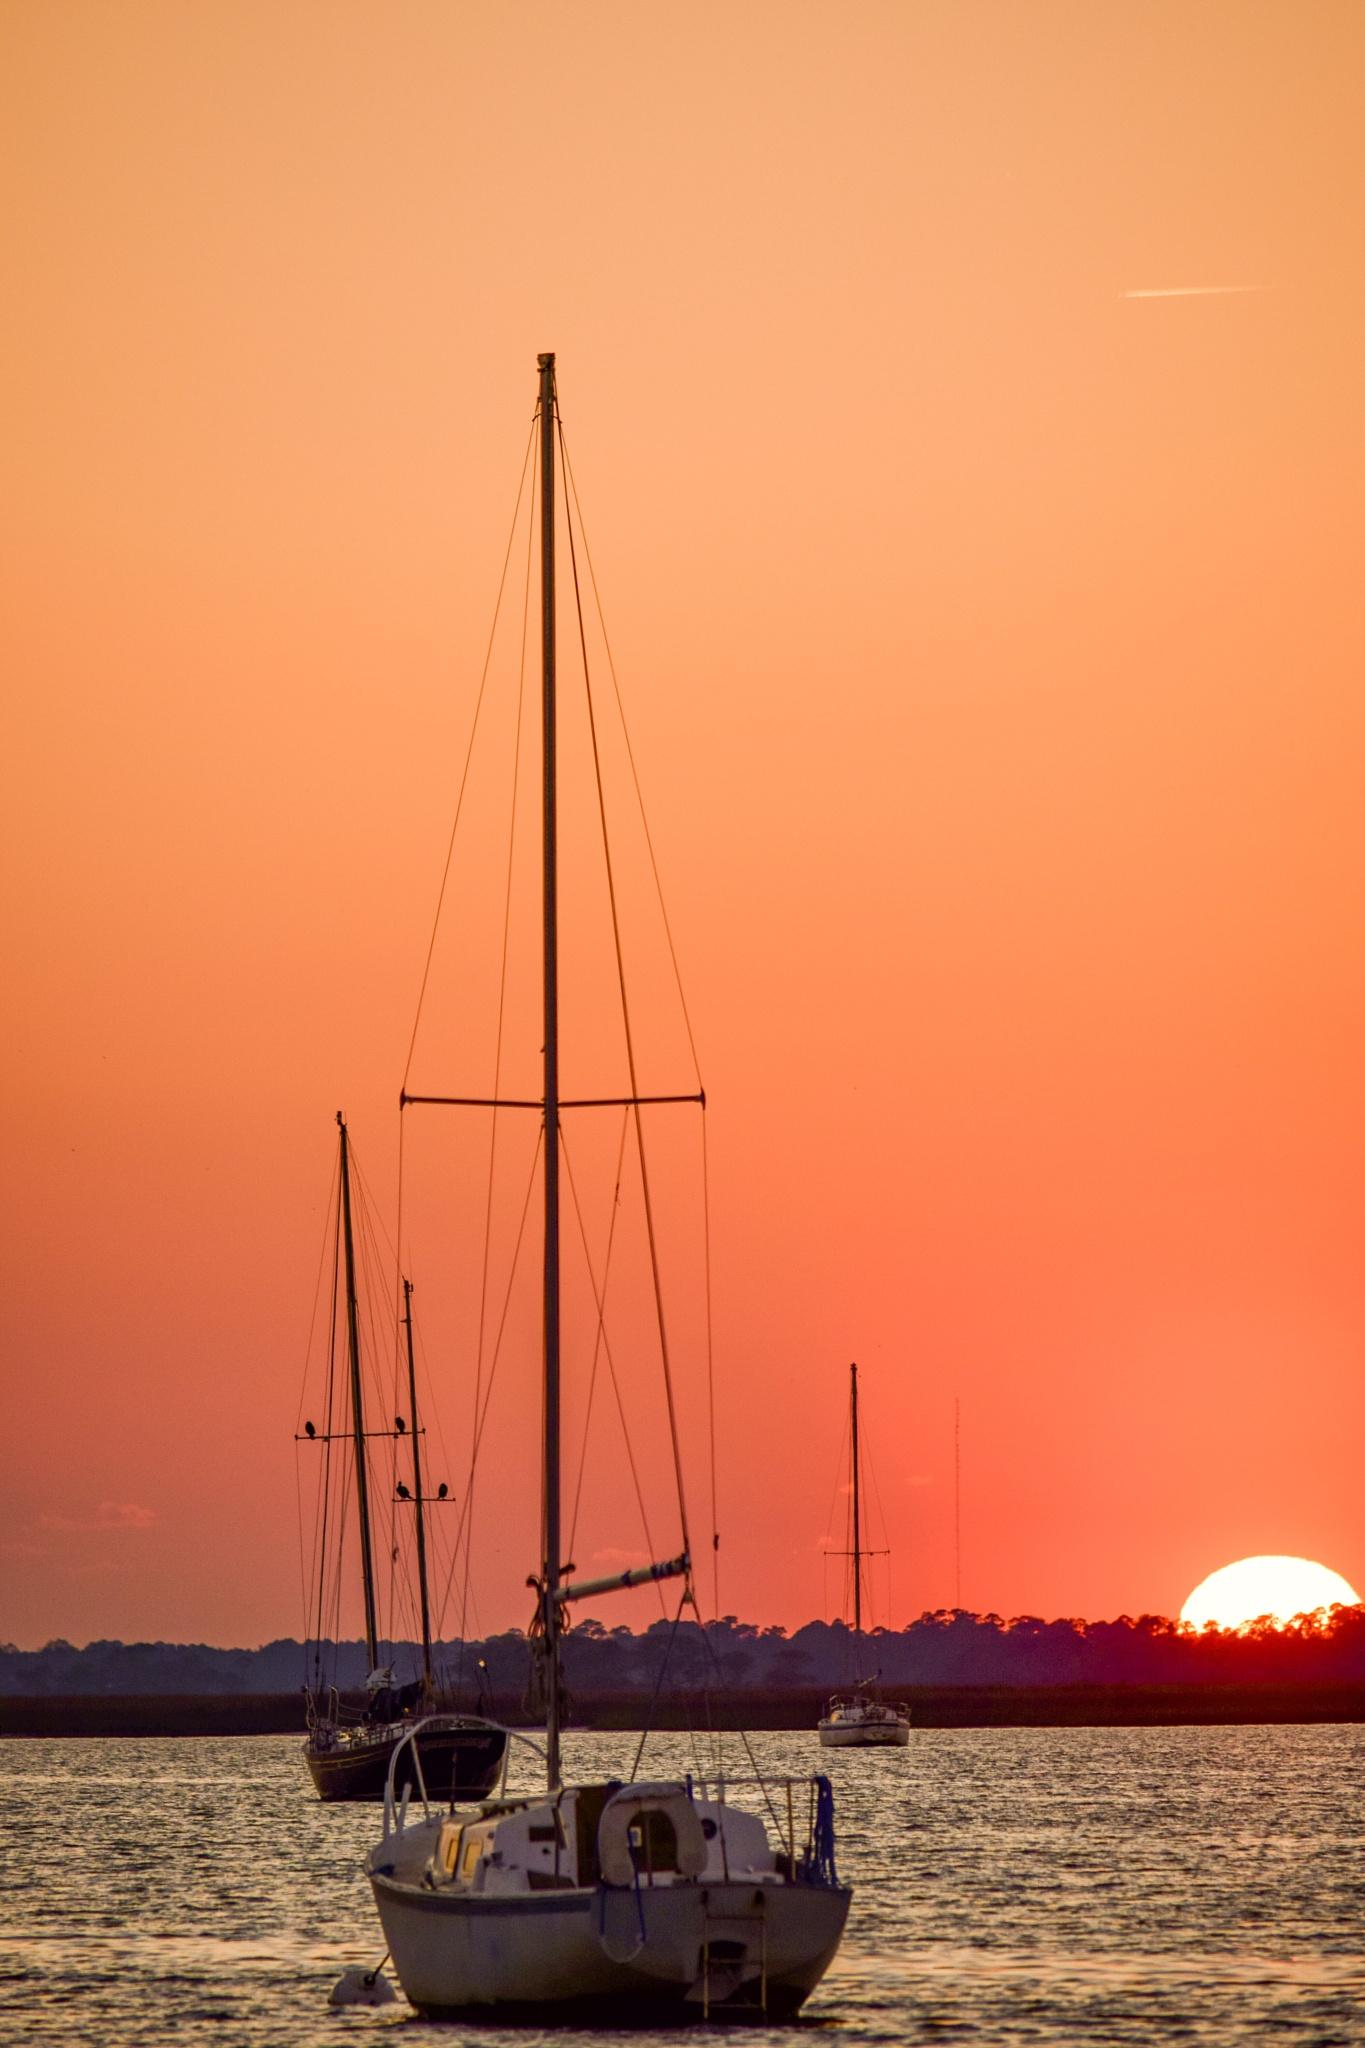 river sunset by PrentissFindlay